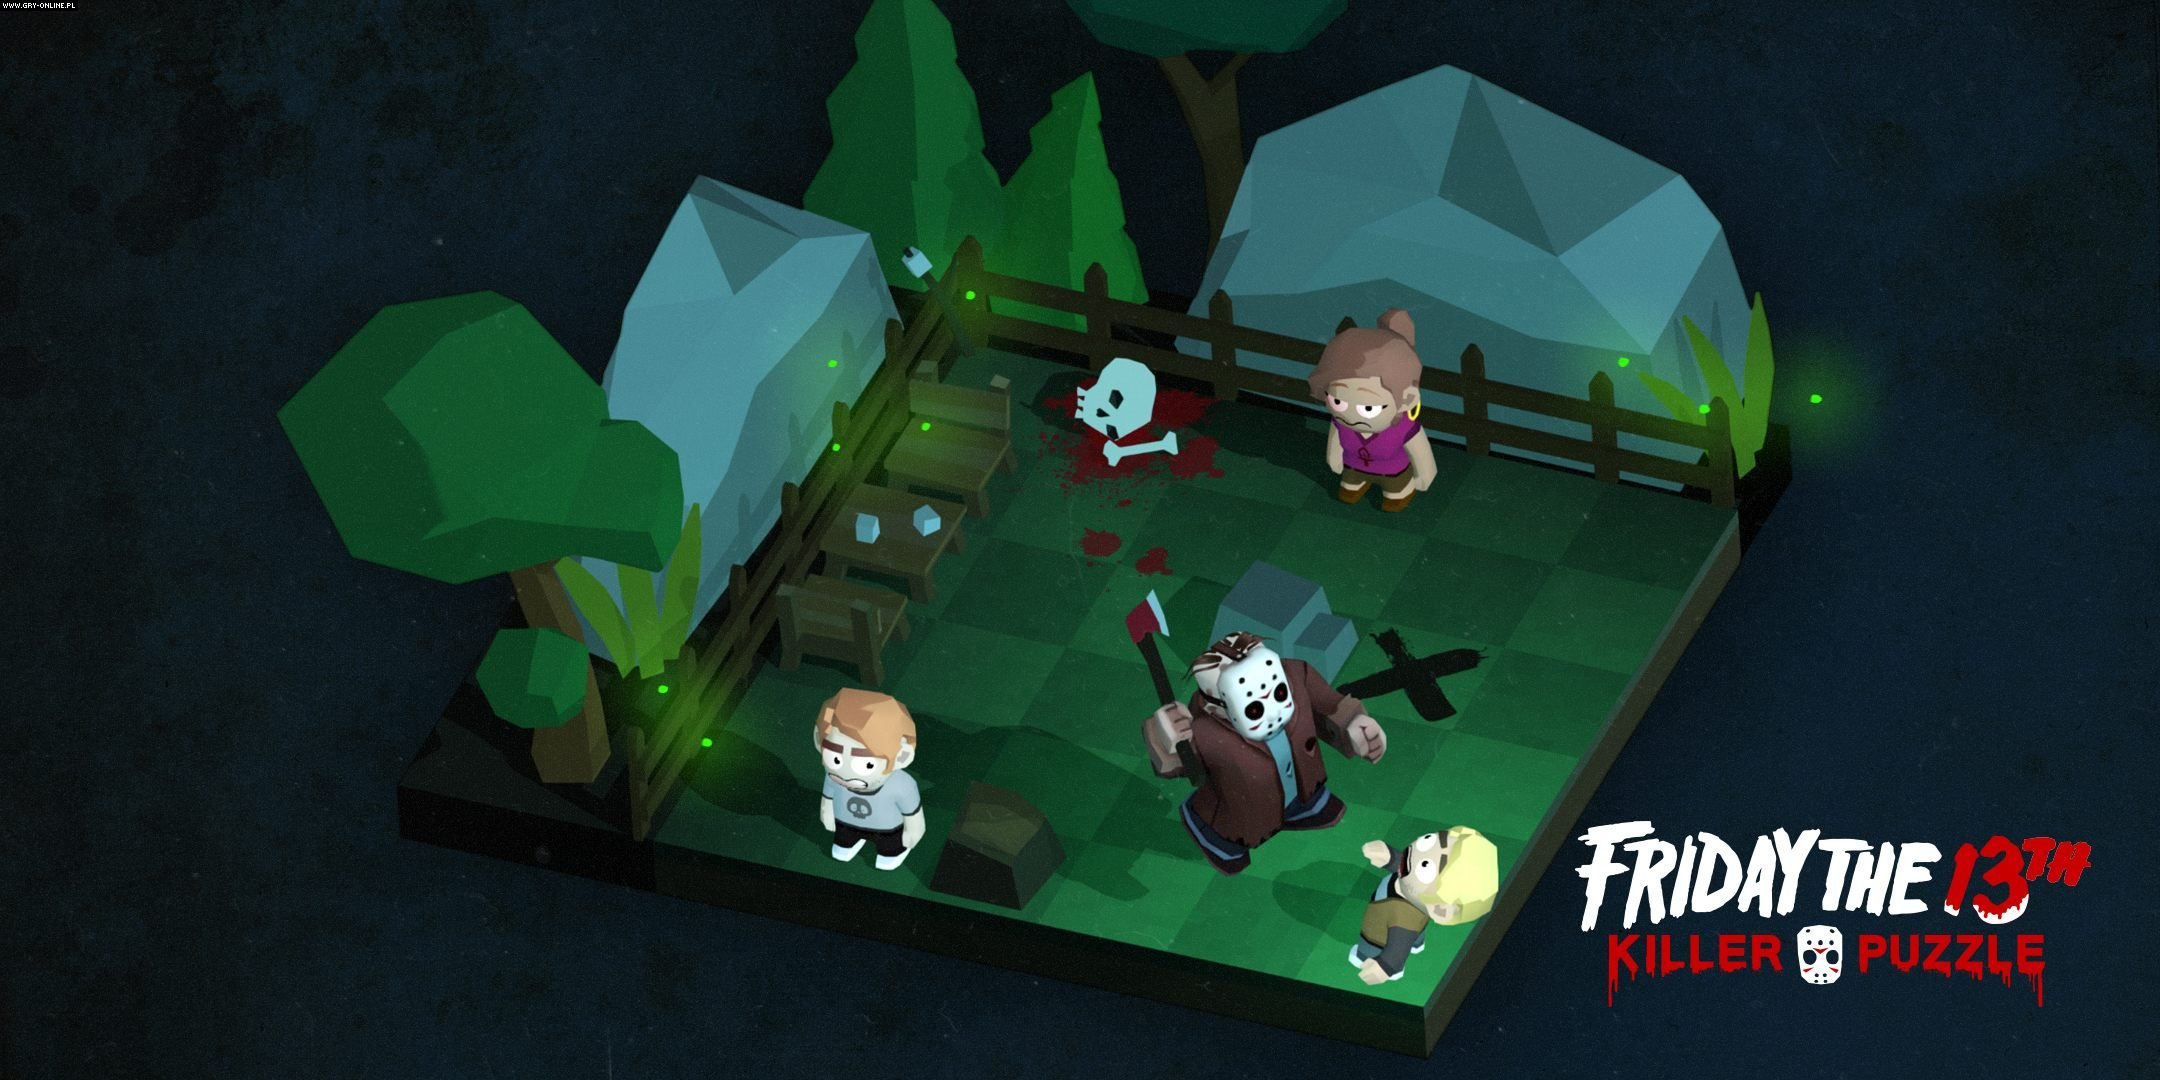 friday the 13th killer puzzle screenshots gallery screenshot